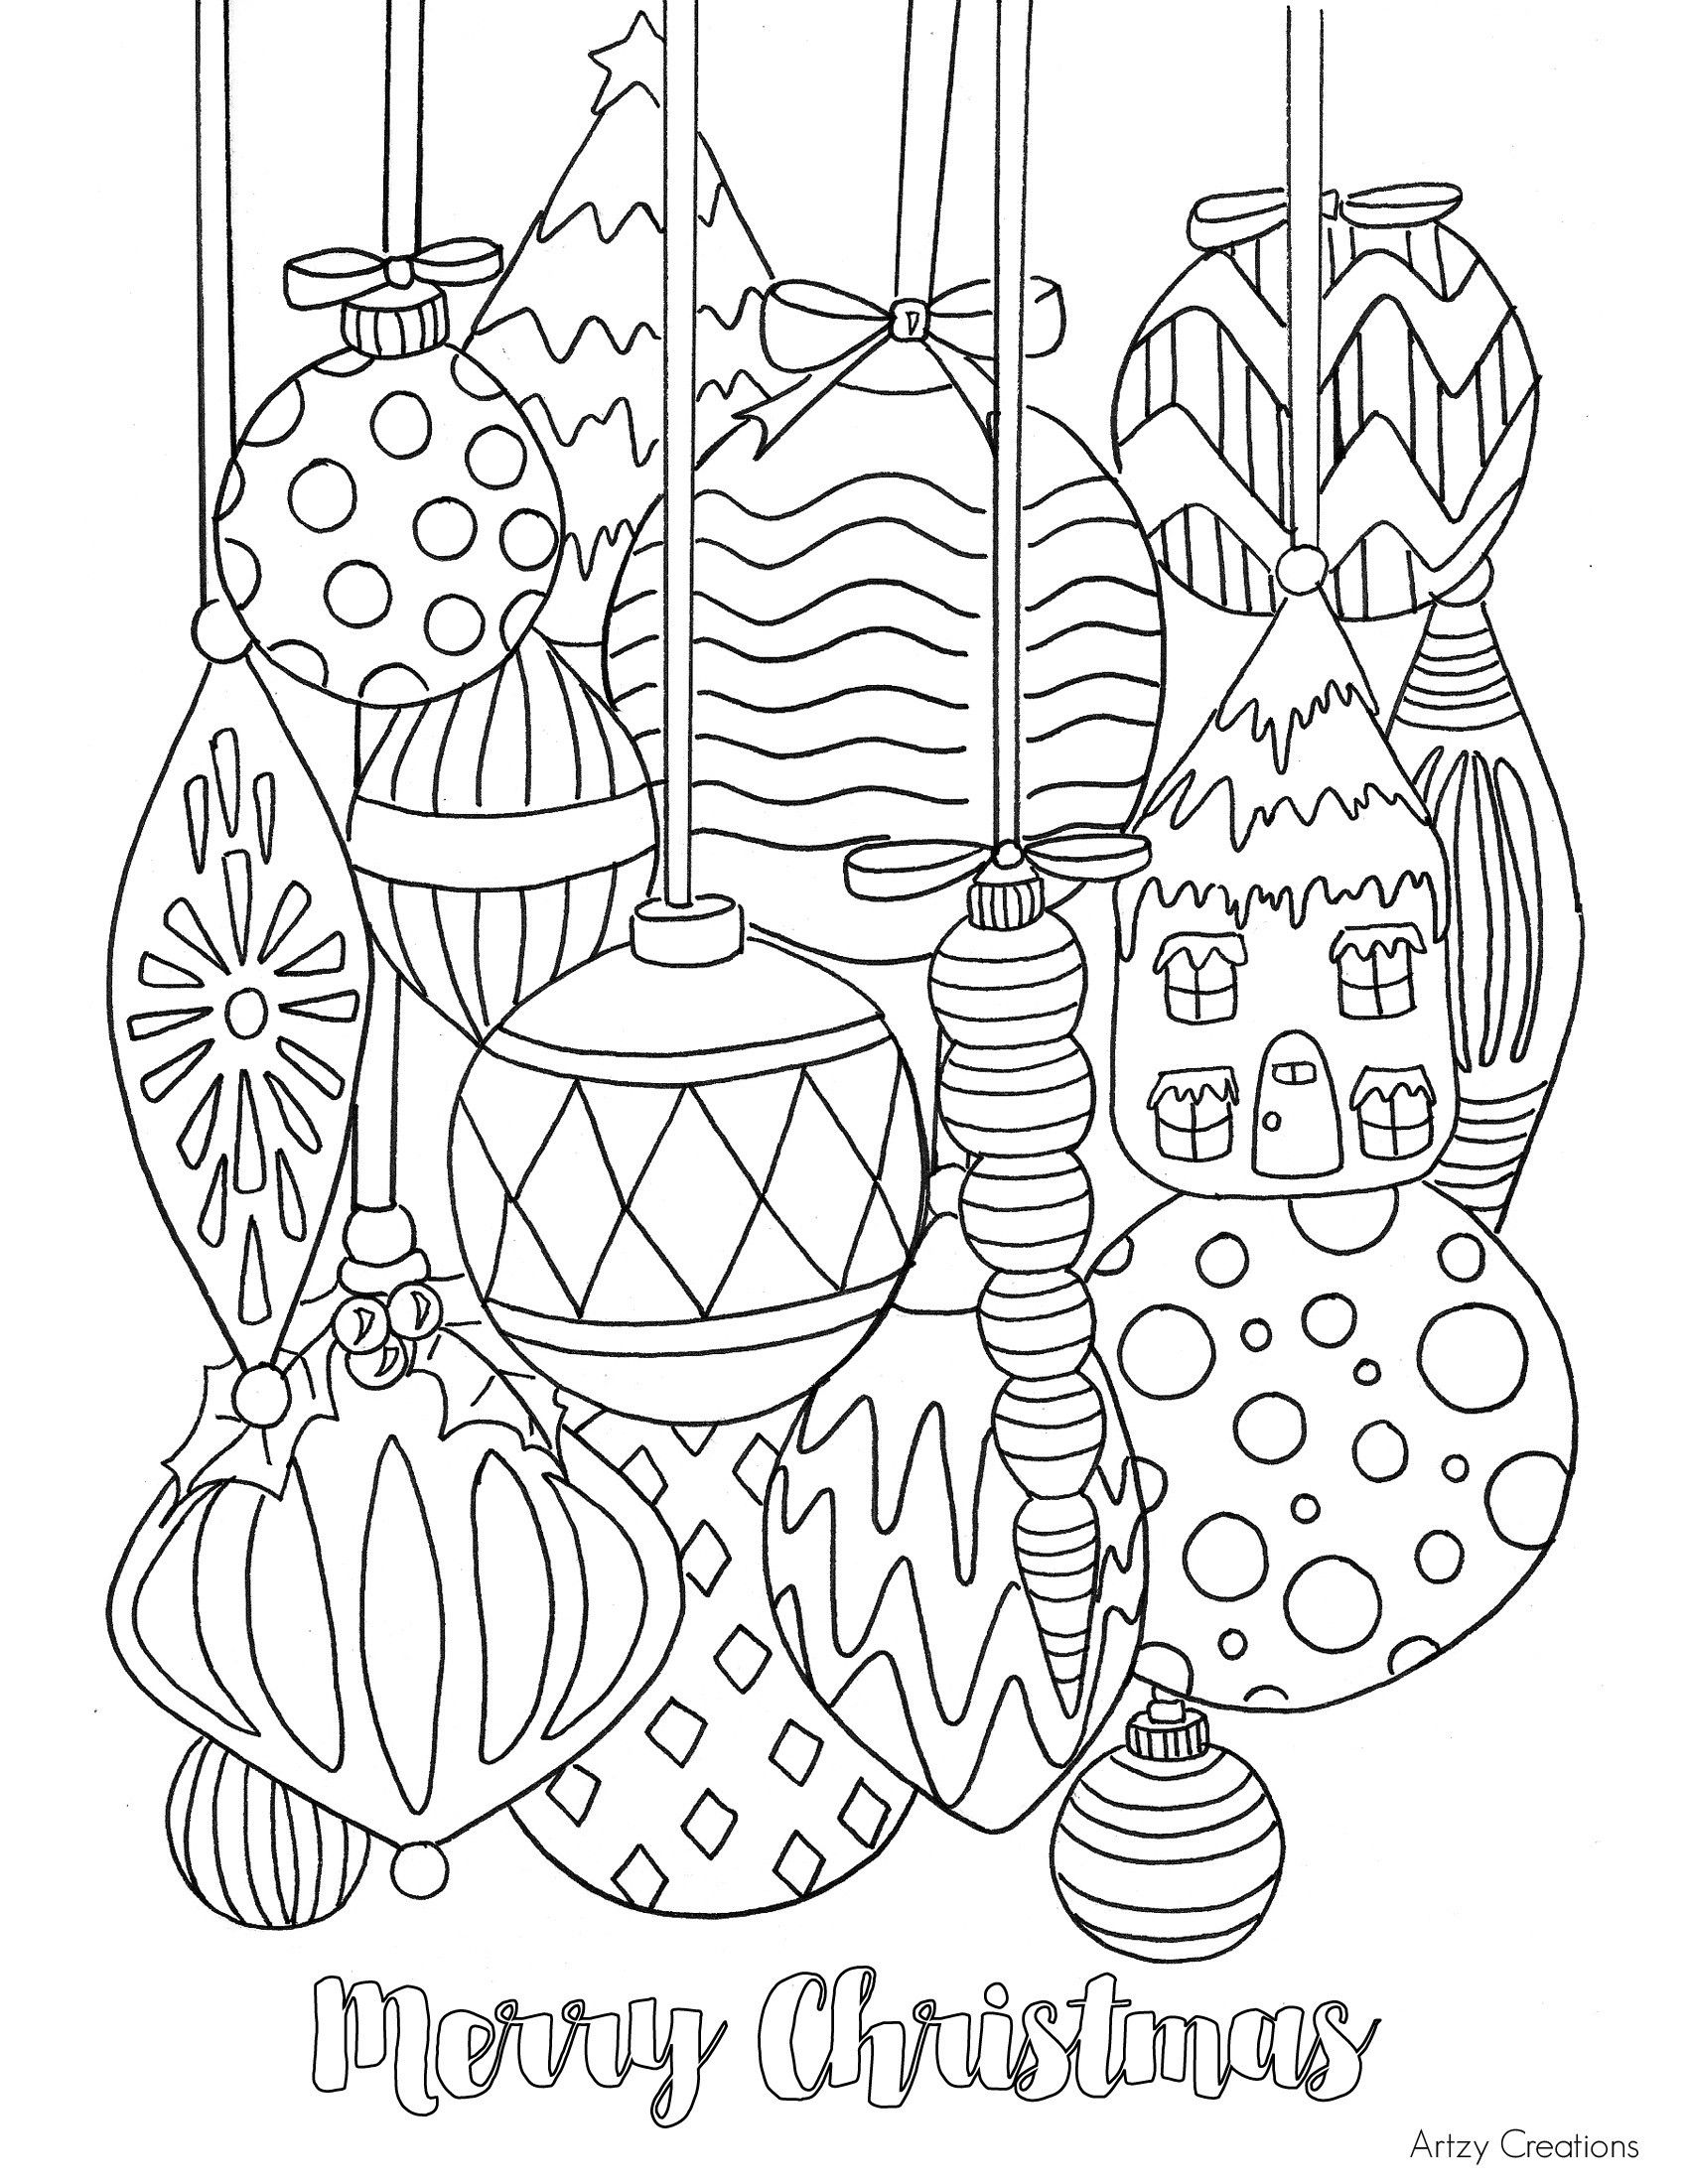 Printable Christmas Coloring Pages For Adults Christmas